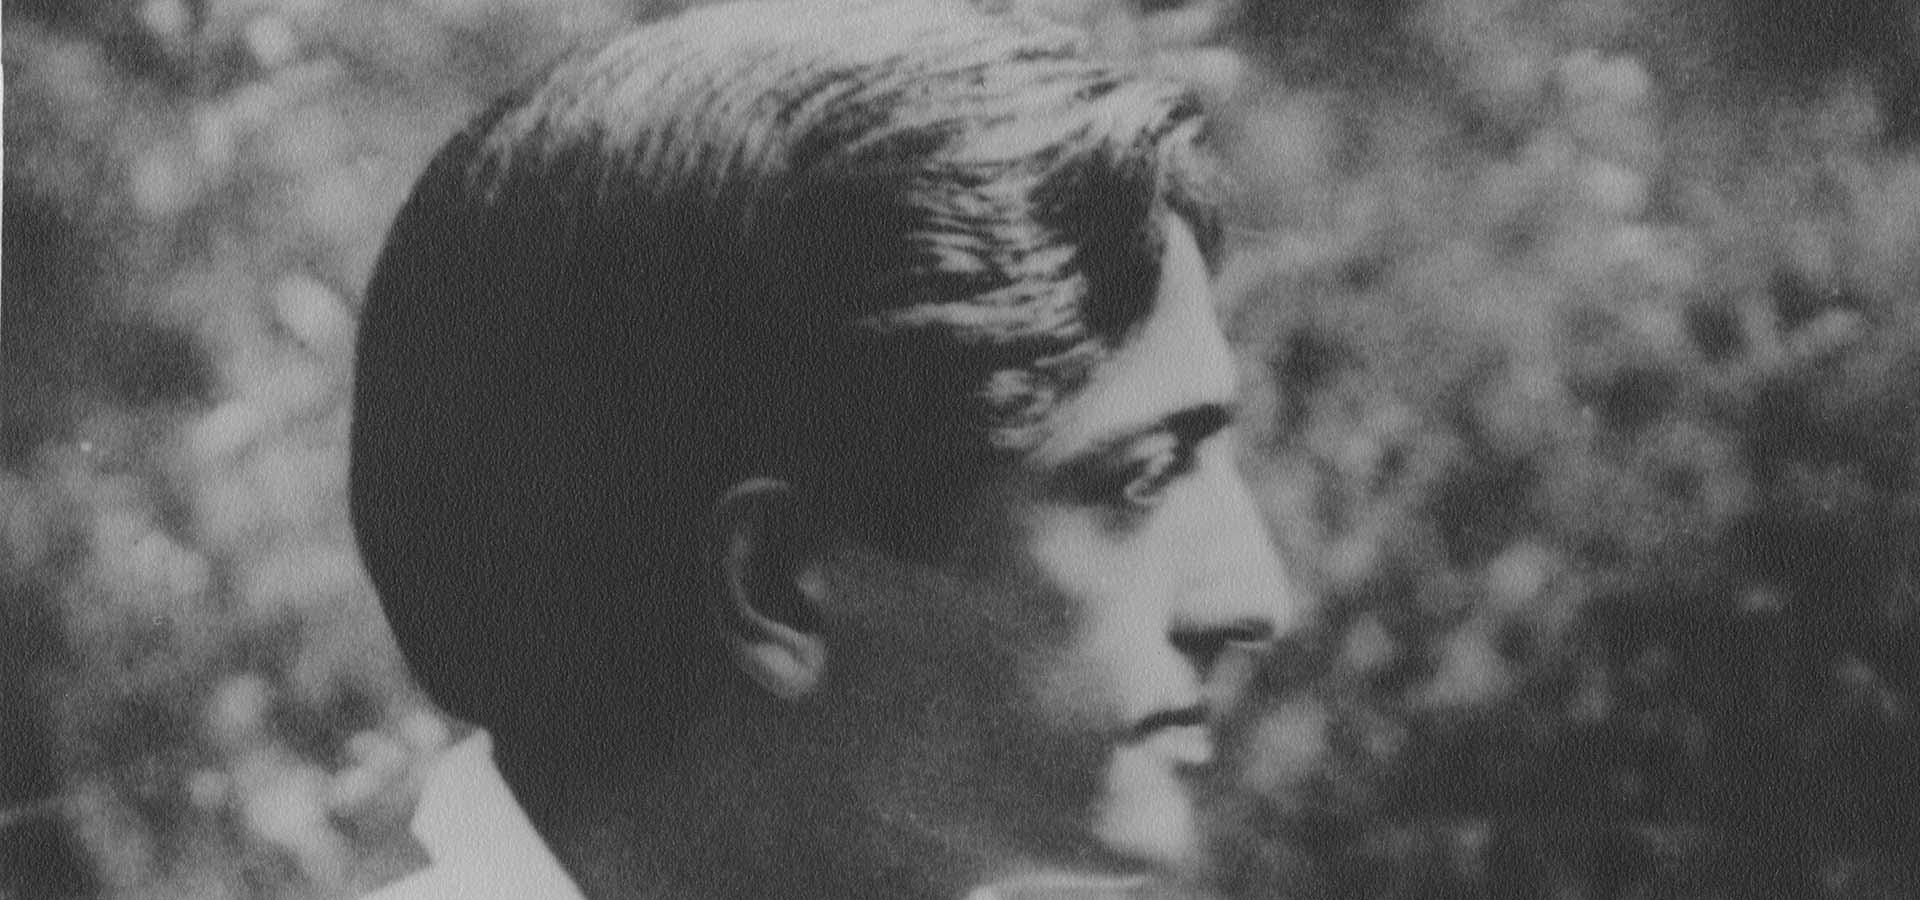 Jiddu Krishnamurti – Η βάρβαρη Δεισιδαιμονία της Κρεοφαγίας - Στα πόδια του Διδασκάλου